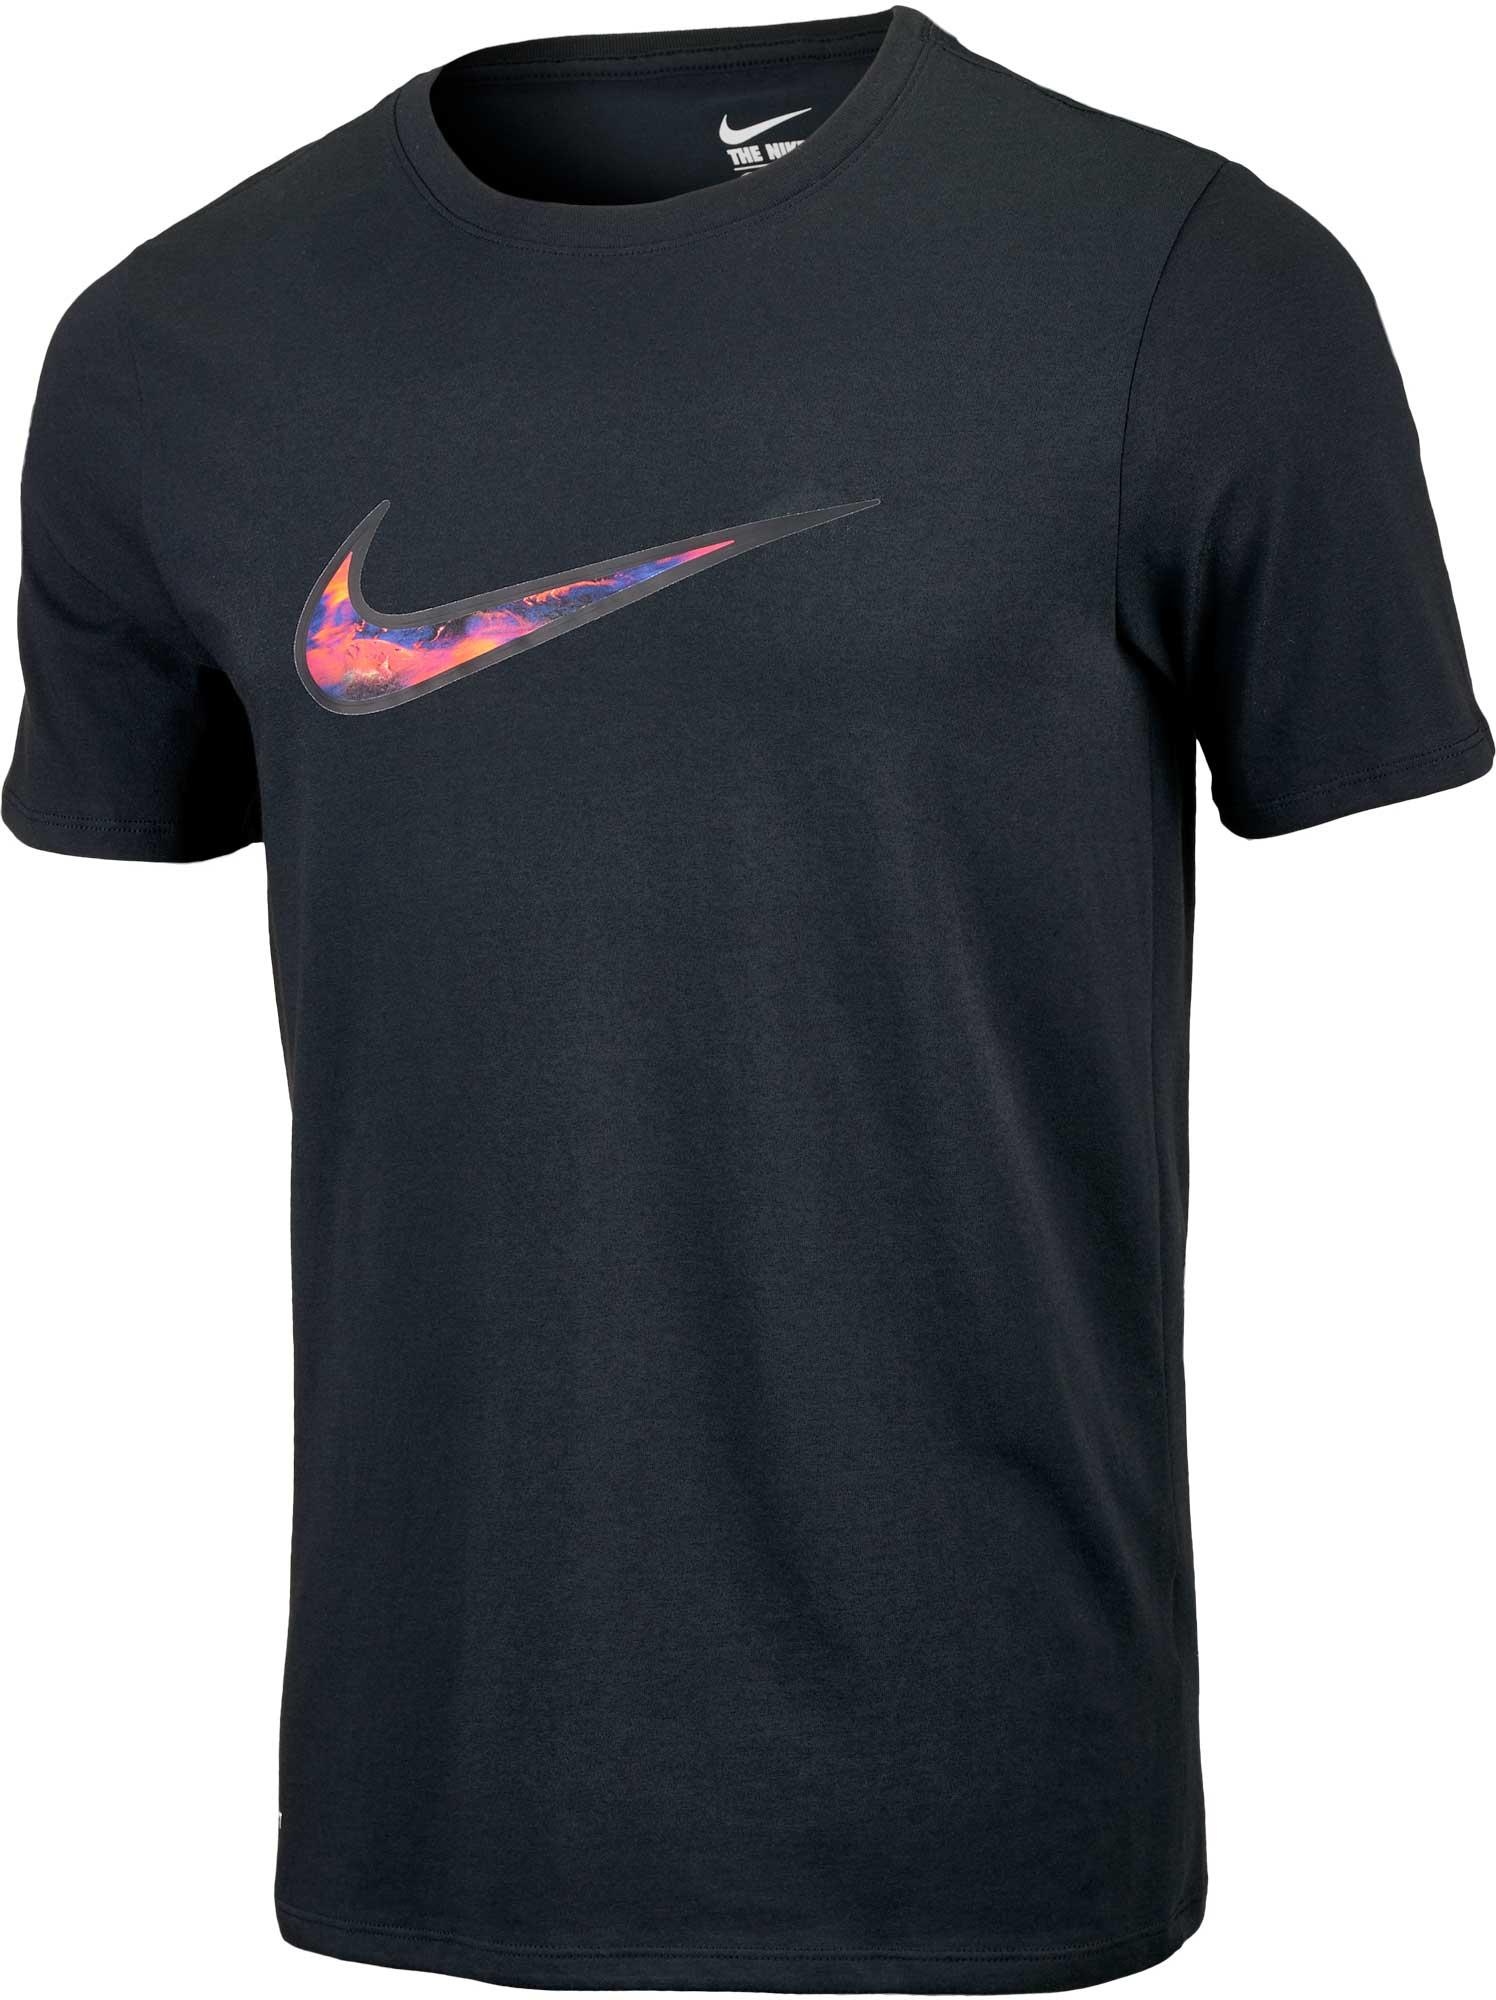 89289dd5e6a Nike CR7 Lava Swoosh Tee - Black CR7 Soccer T-Shirts